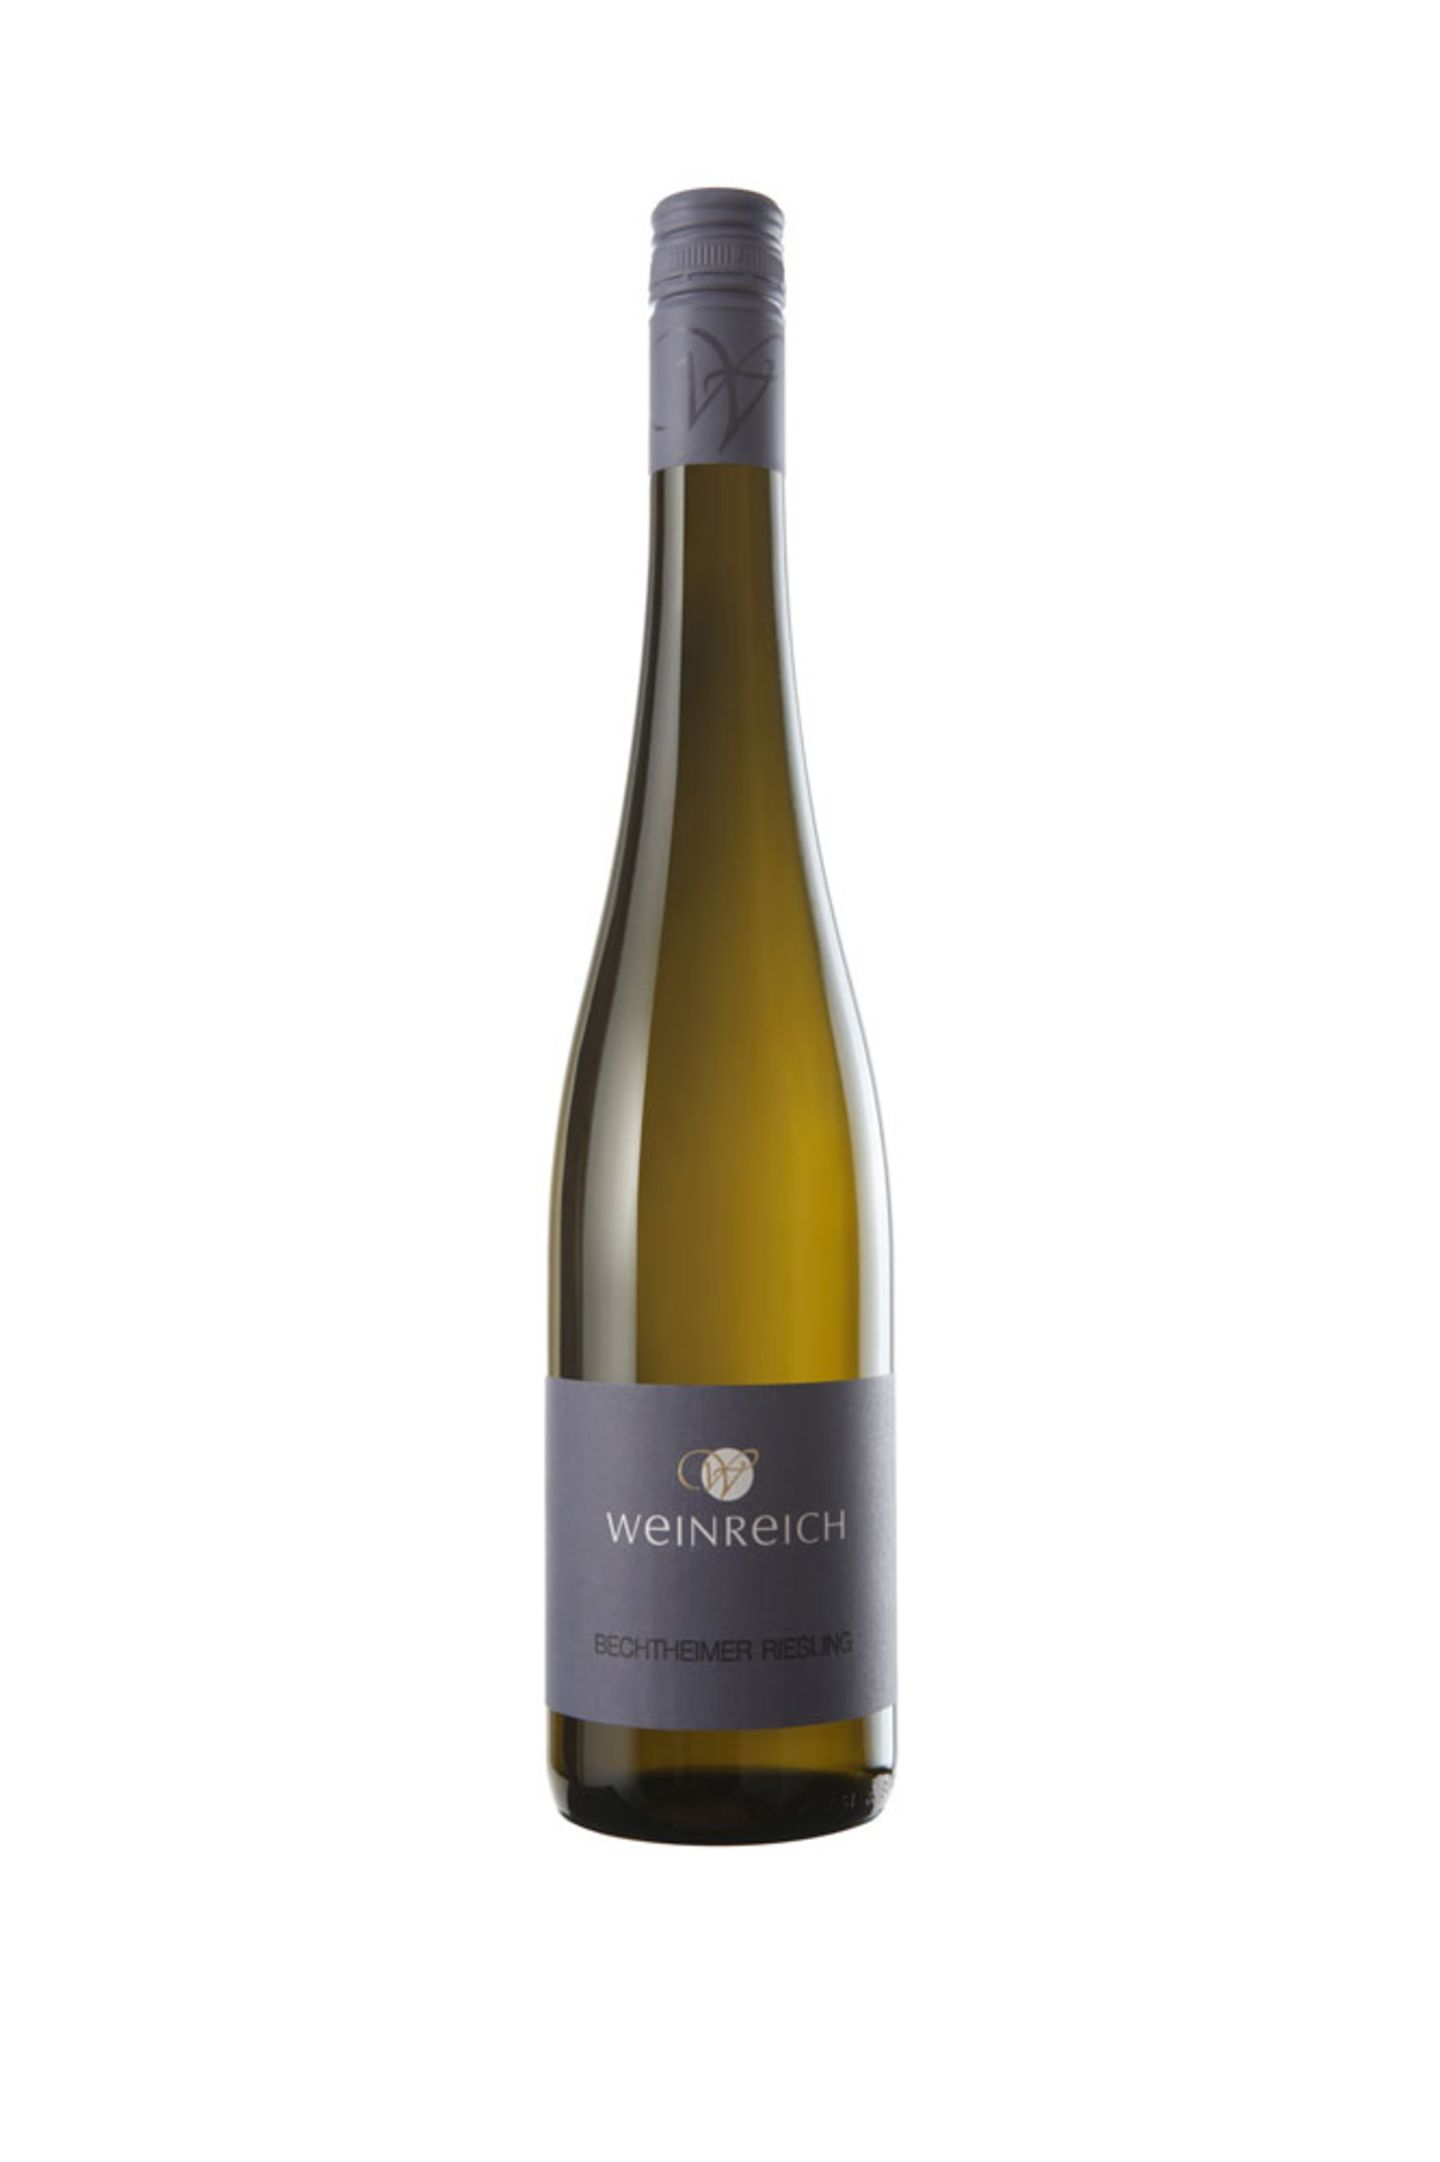 Weingut Weinreich: Bechtheimer Riesling